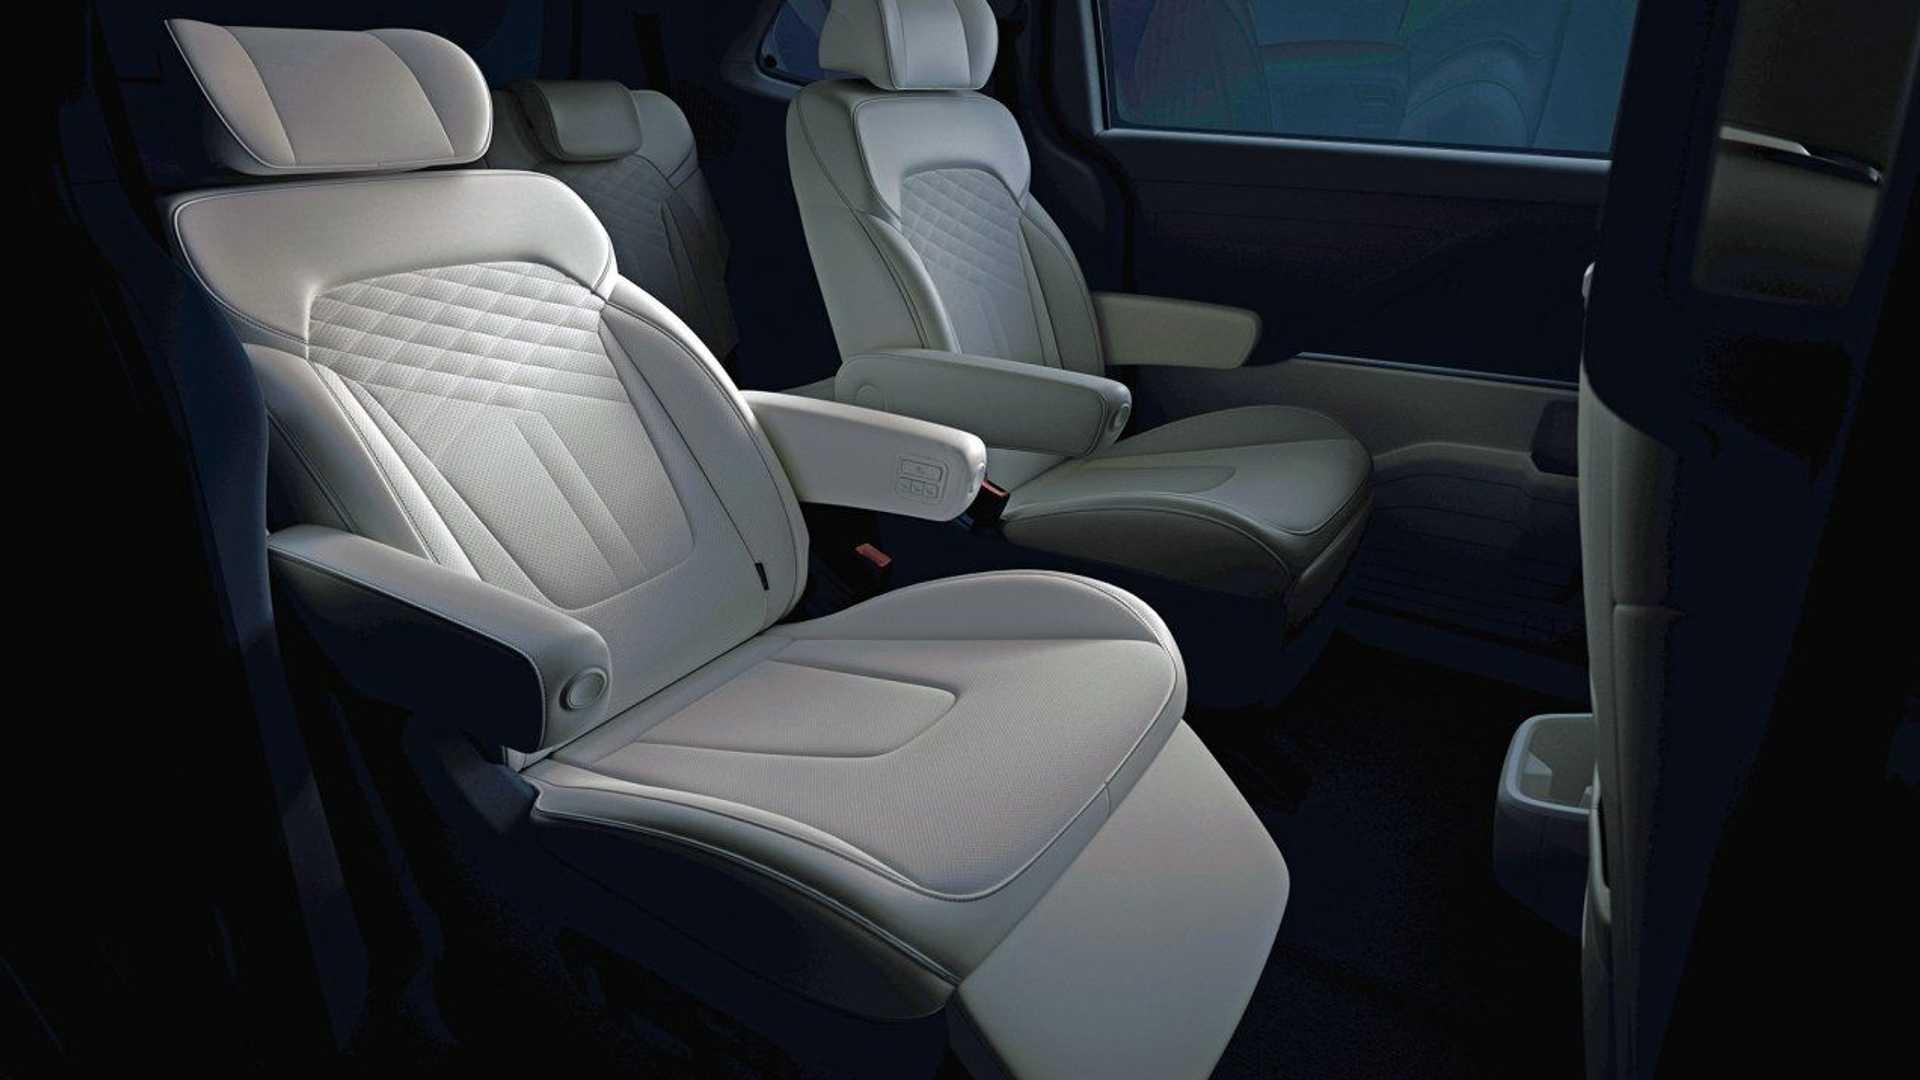 Hyundai-Custo-photos-8